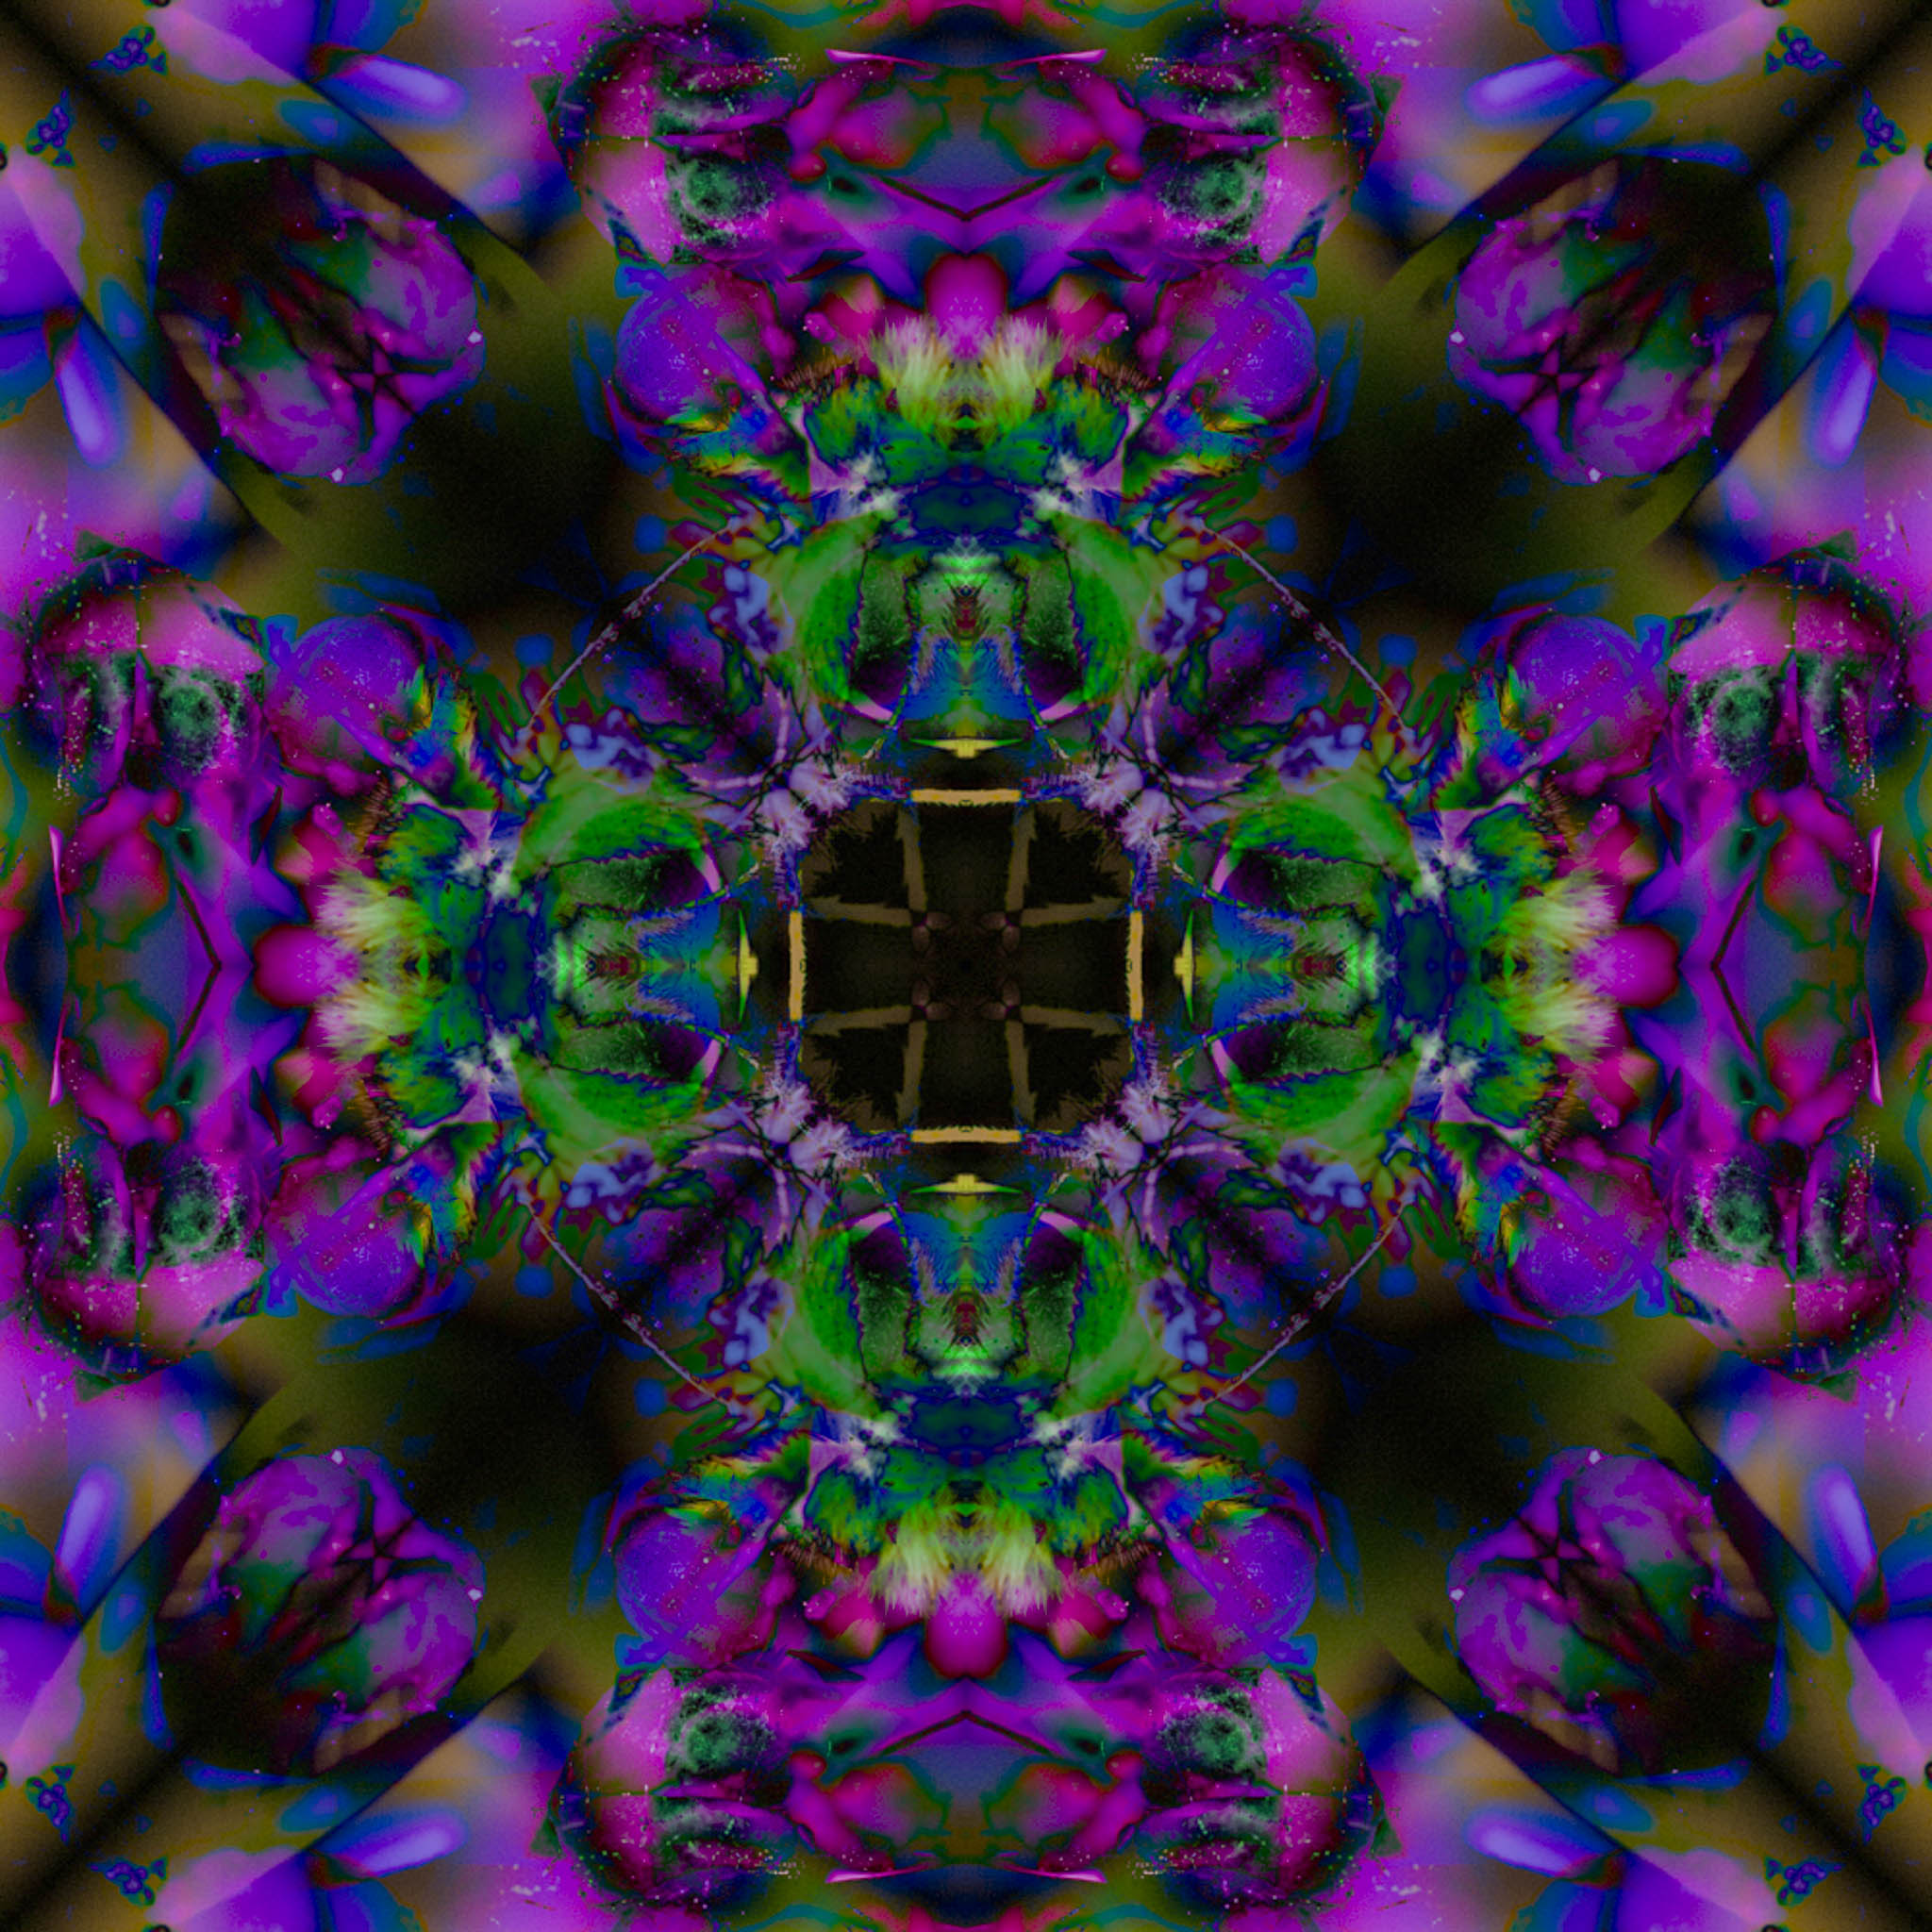 Mandala from Hummingbird Moth on Lilac - DMHopp